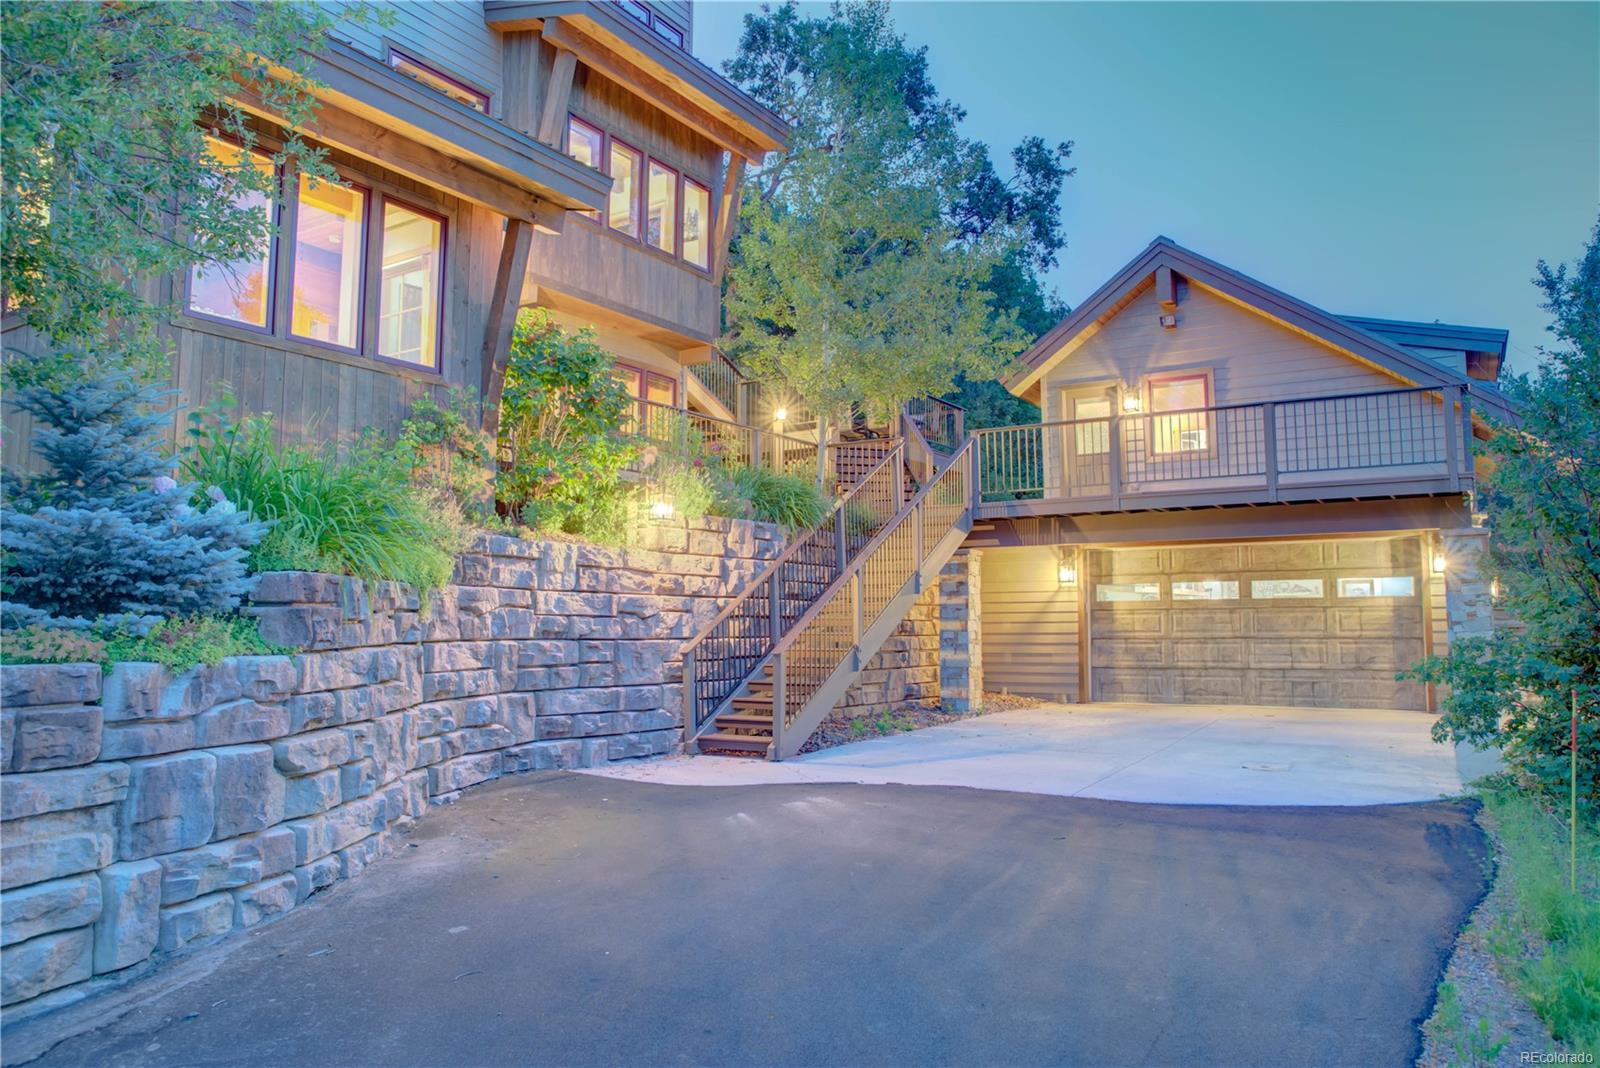 2770 Laurel Lane, Steamboat Springs, CO 80487 - Steamboat Springs, CO real estate listing